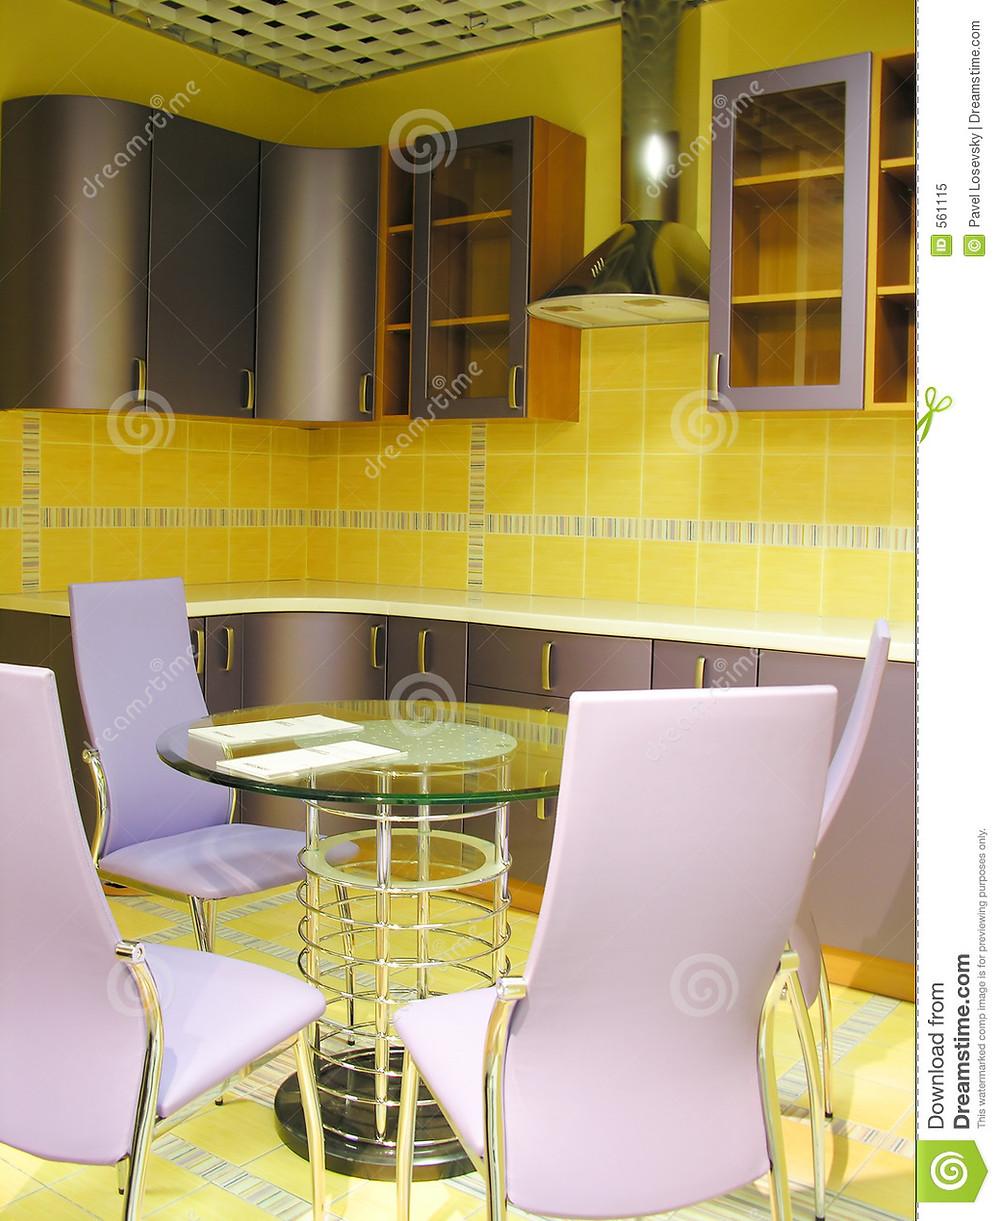 Photo courtesy of Dreamstime - yellow gray kitchen